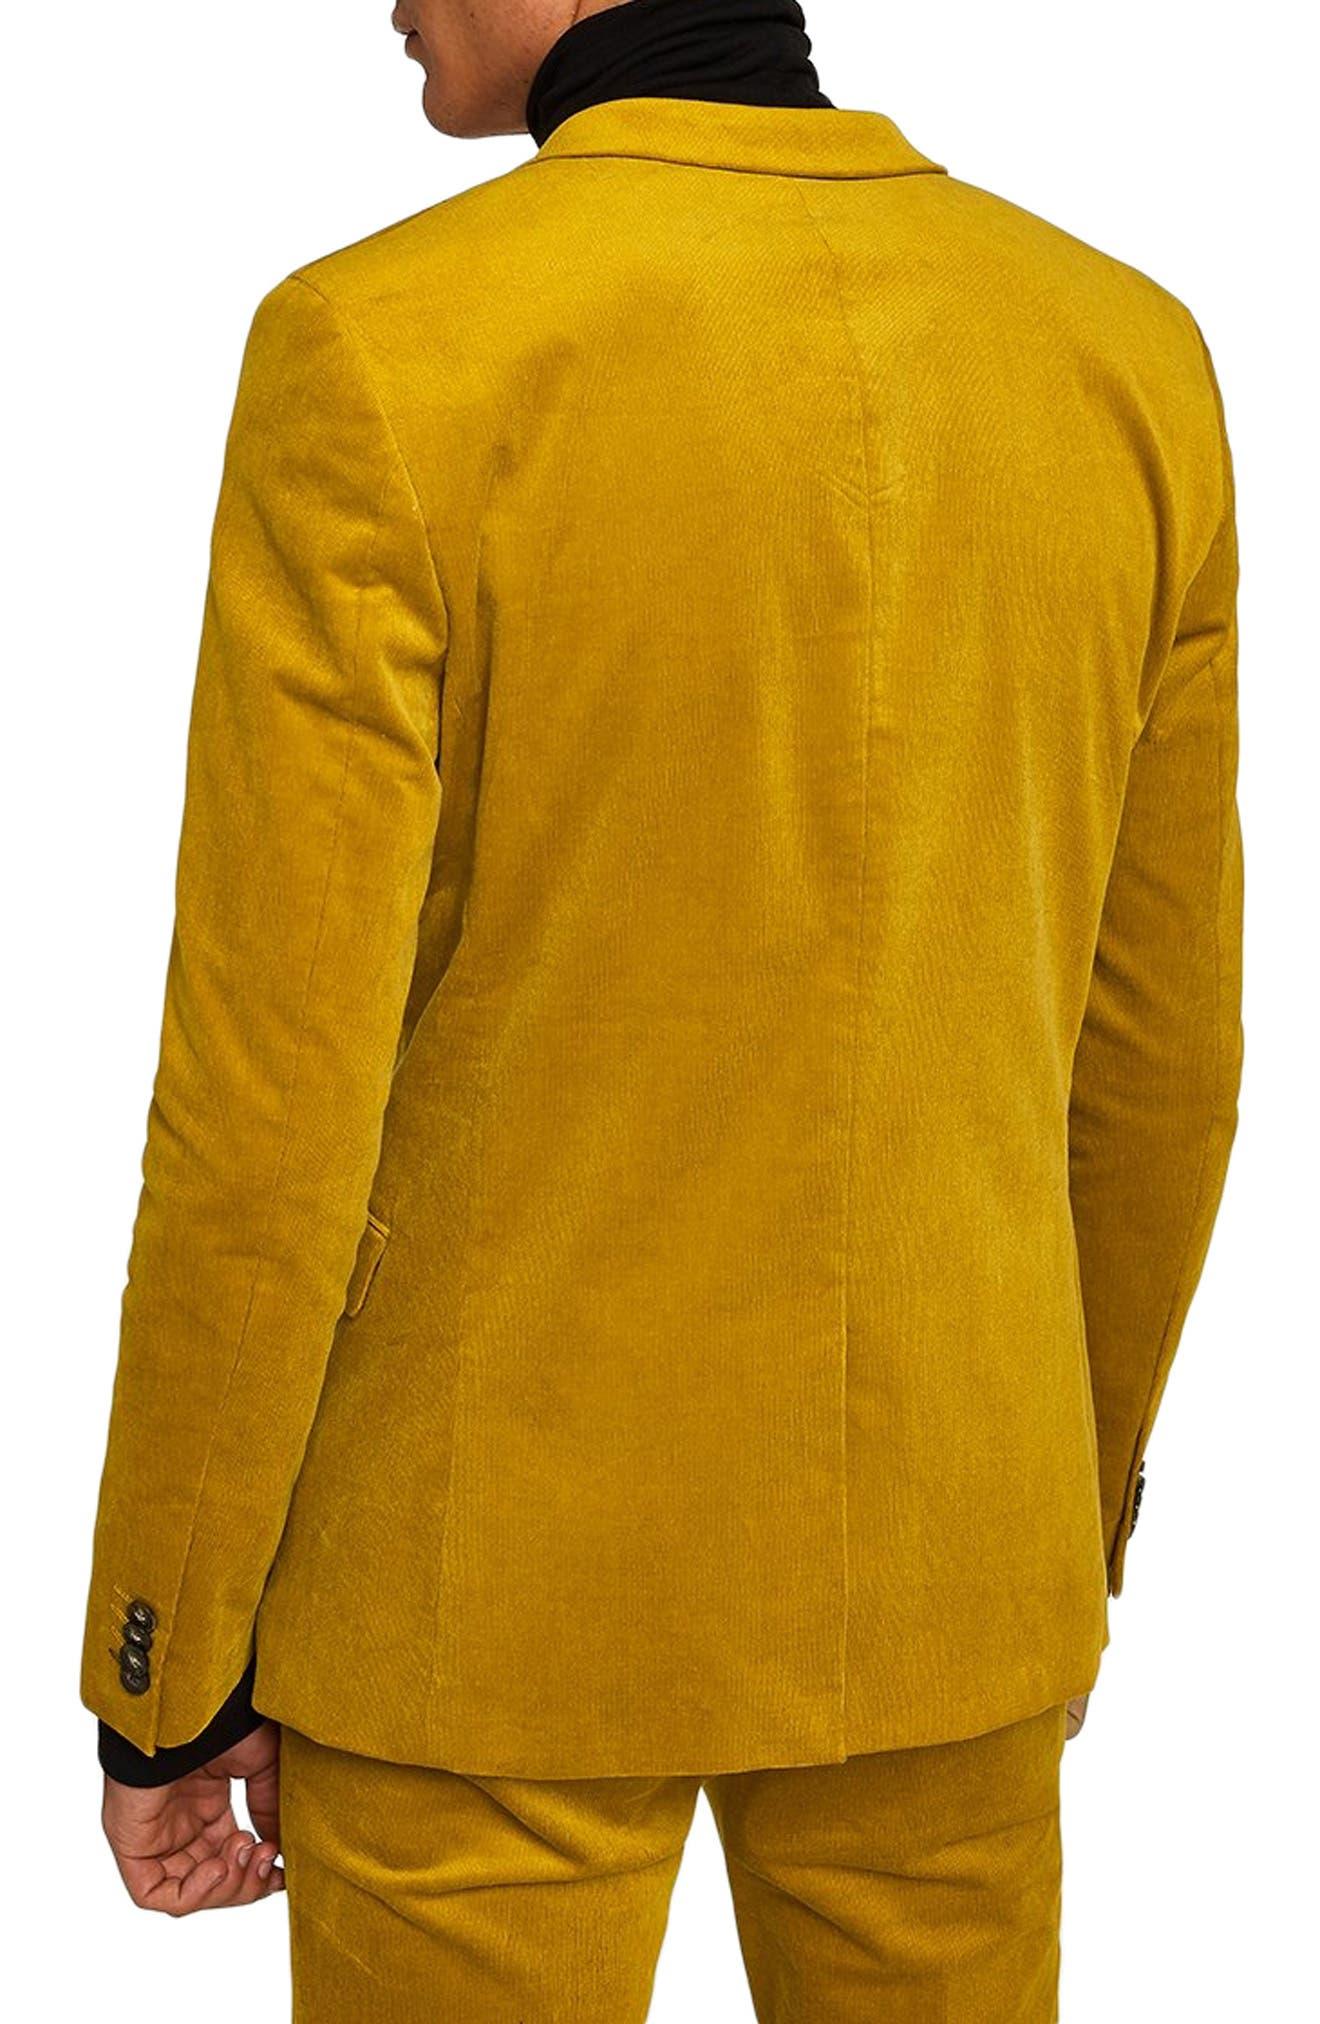 TOPMAN,                             Corduroy Super Skinny Suit Jacket,                             Alternate thumbnail 2, color,                             700